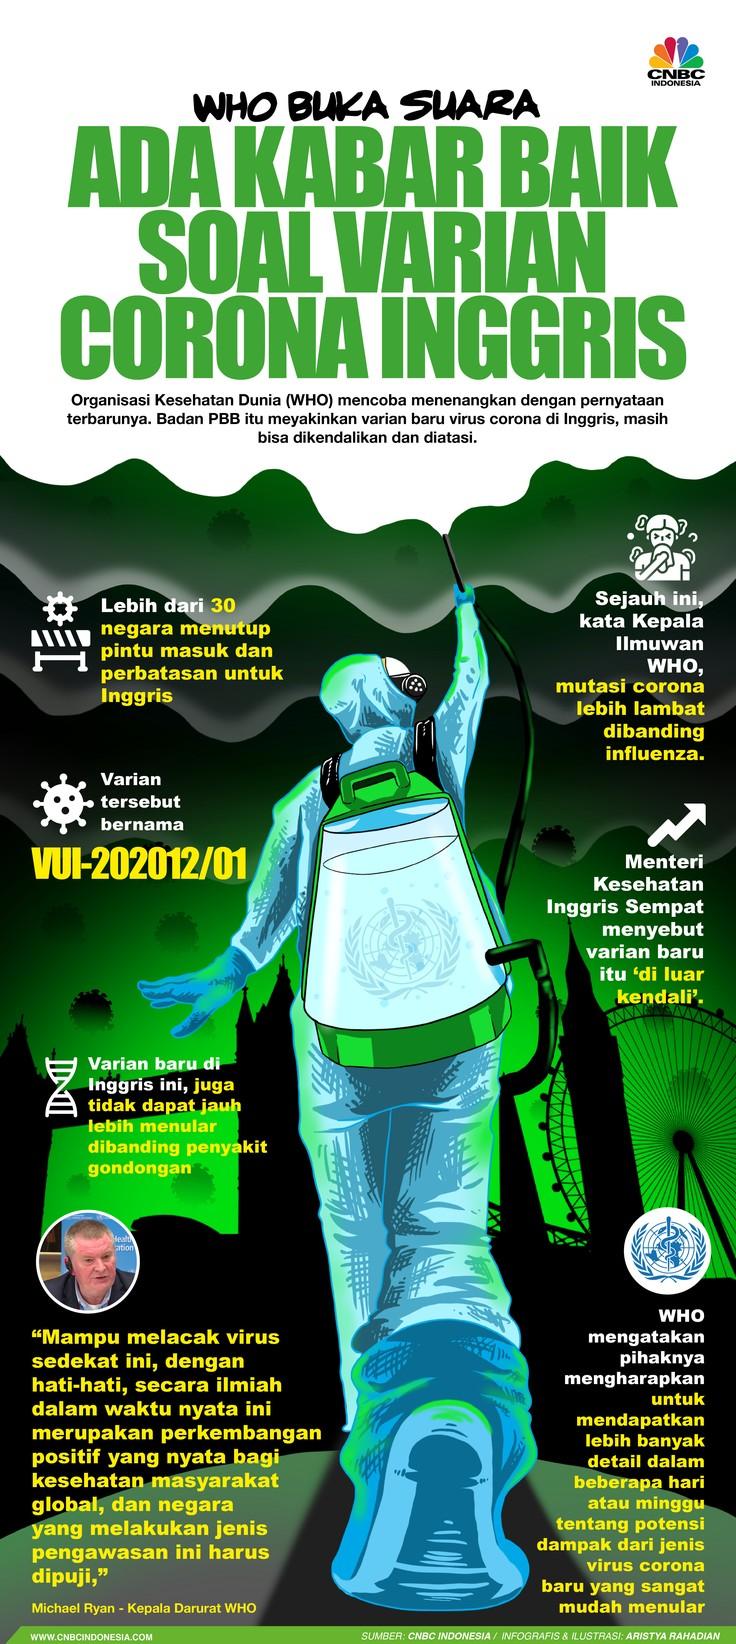 Infografis/ WHO Buka Suara, Ada Kabar Baik Soal Varian Corona Inggris/Aristya Rahadian